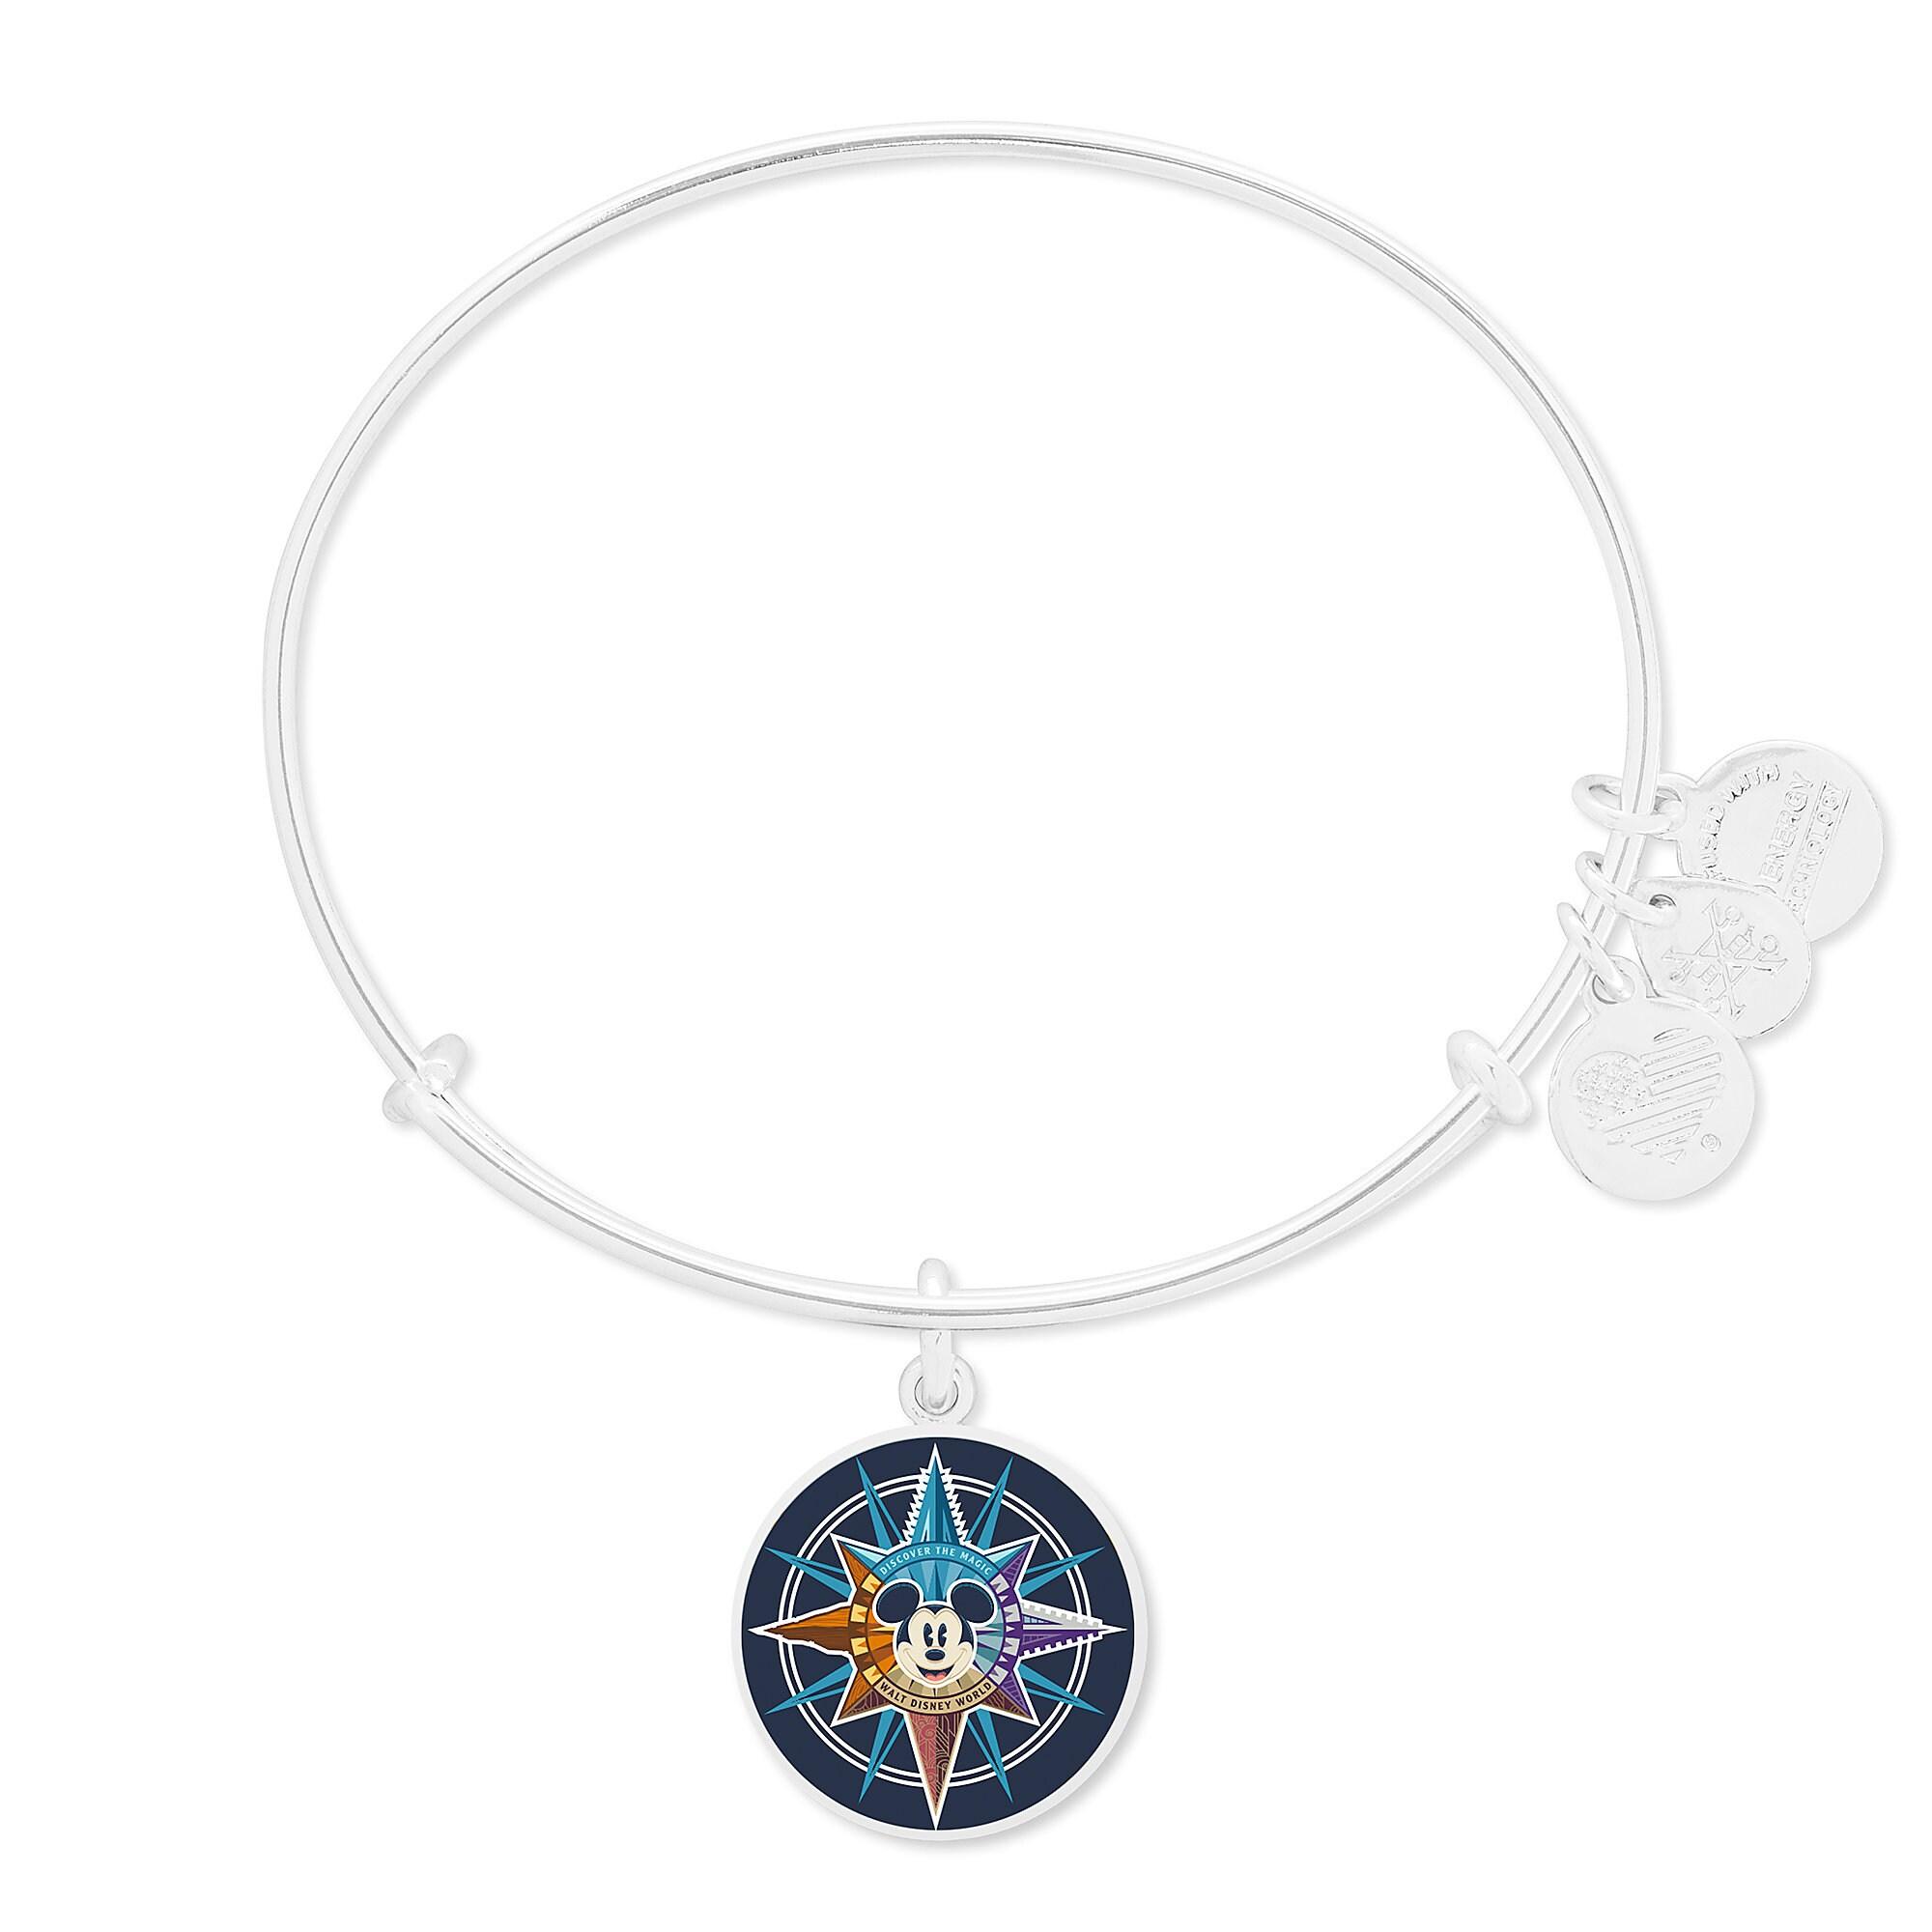 Mickey Mouse Compass Bangle by Alex and Ani - Walt Disney World